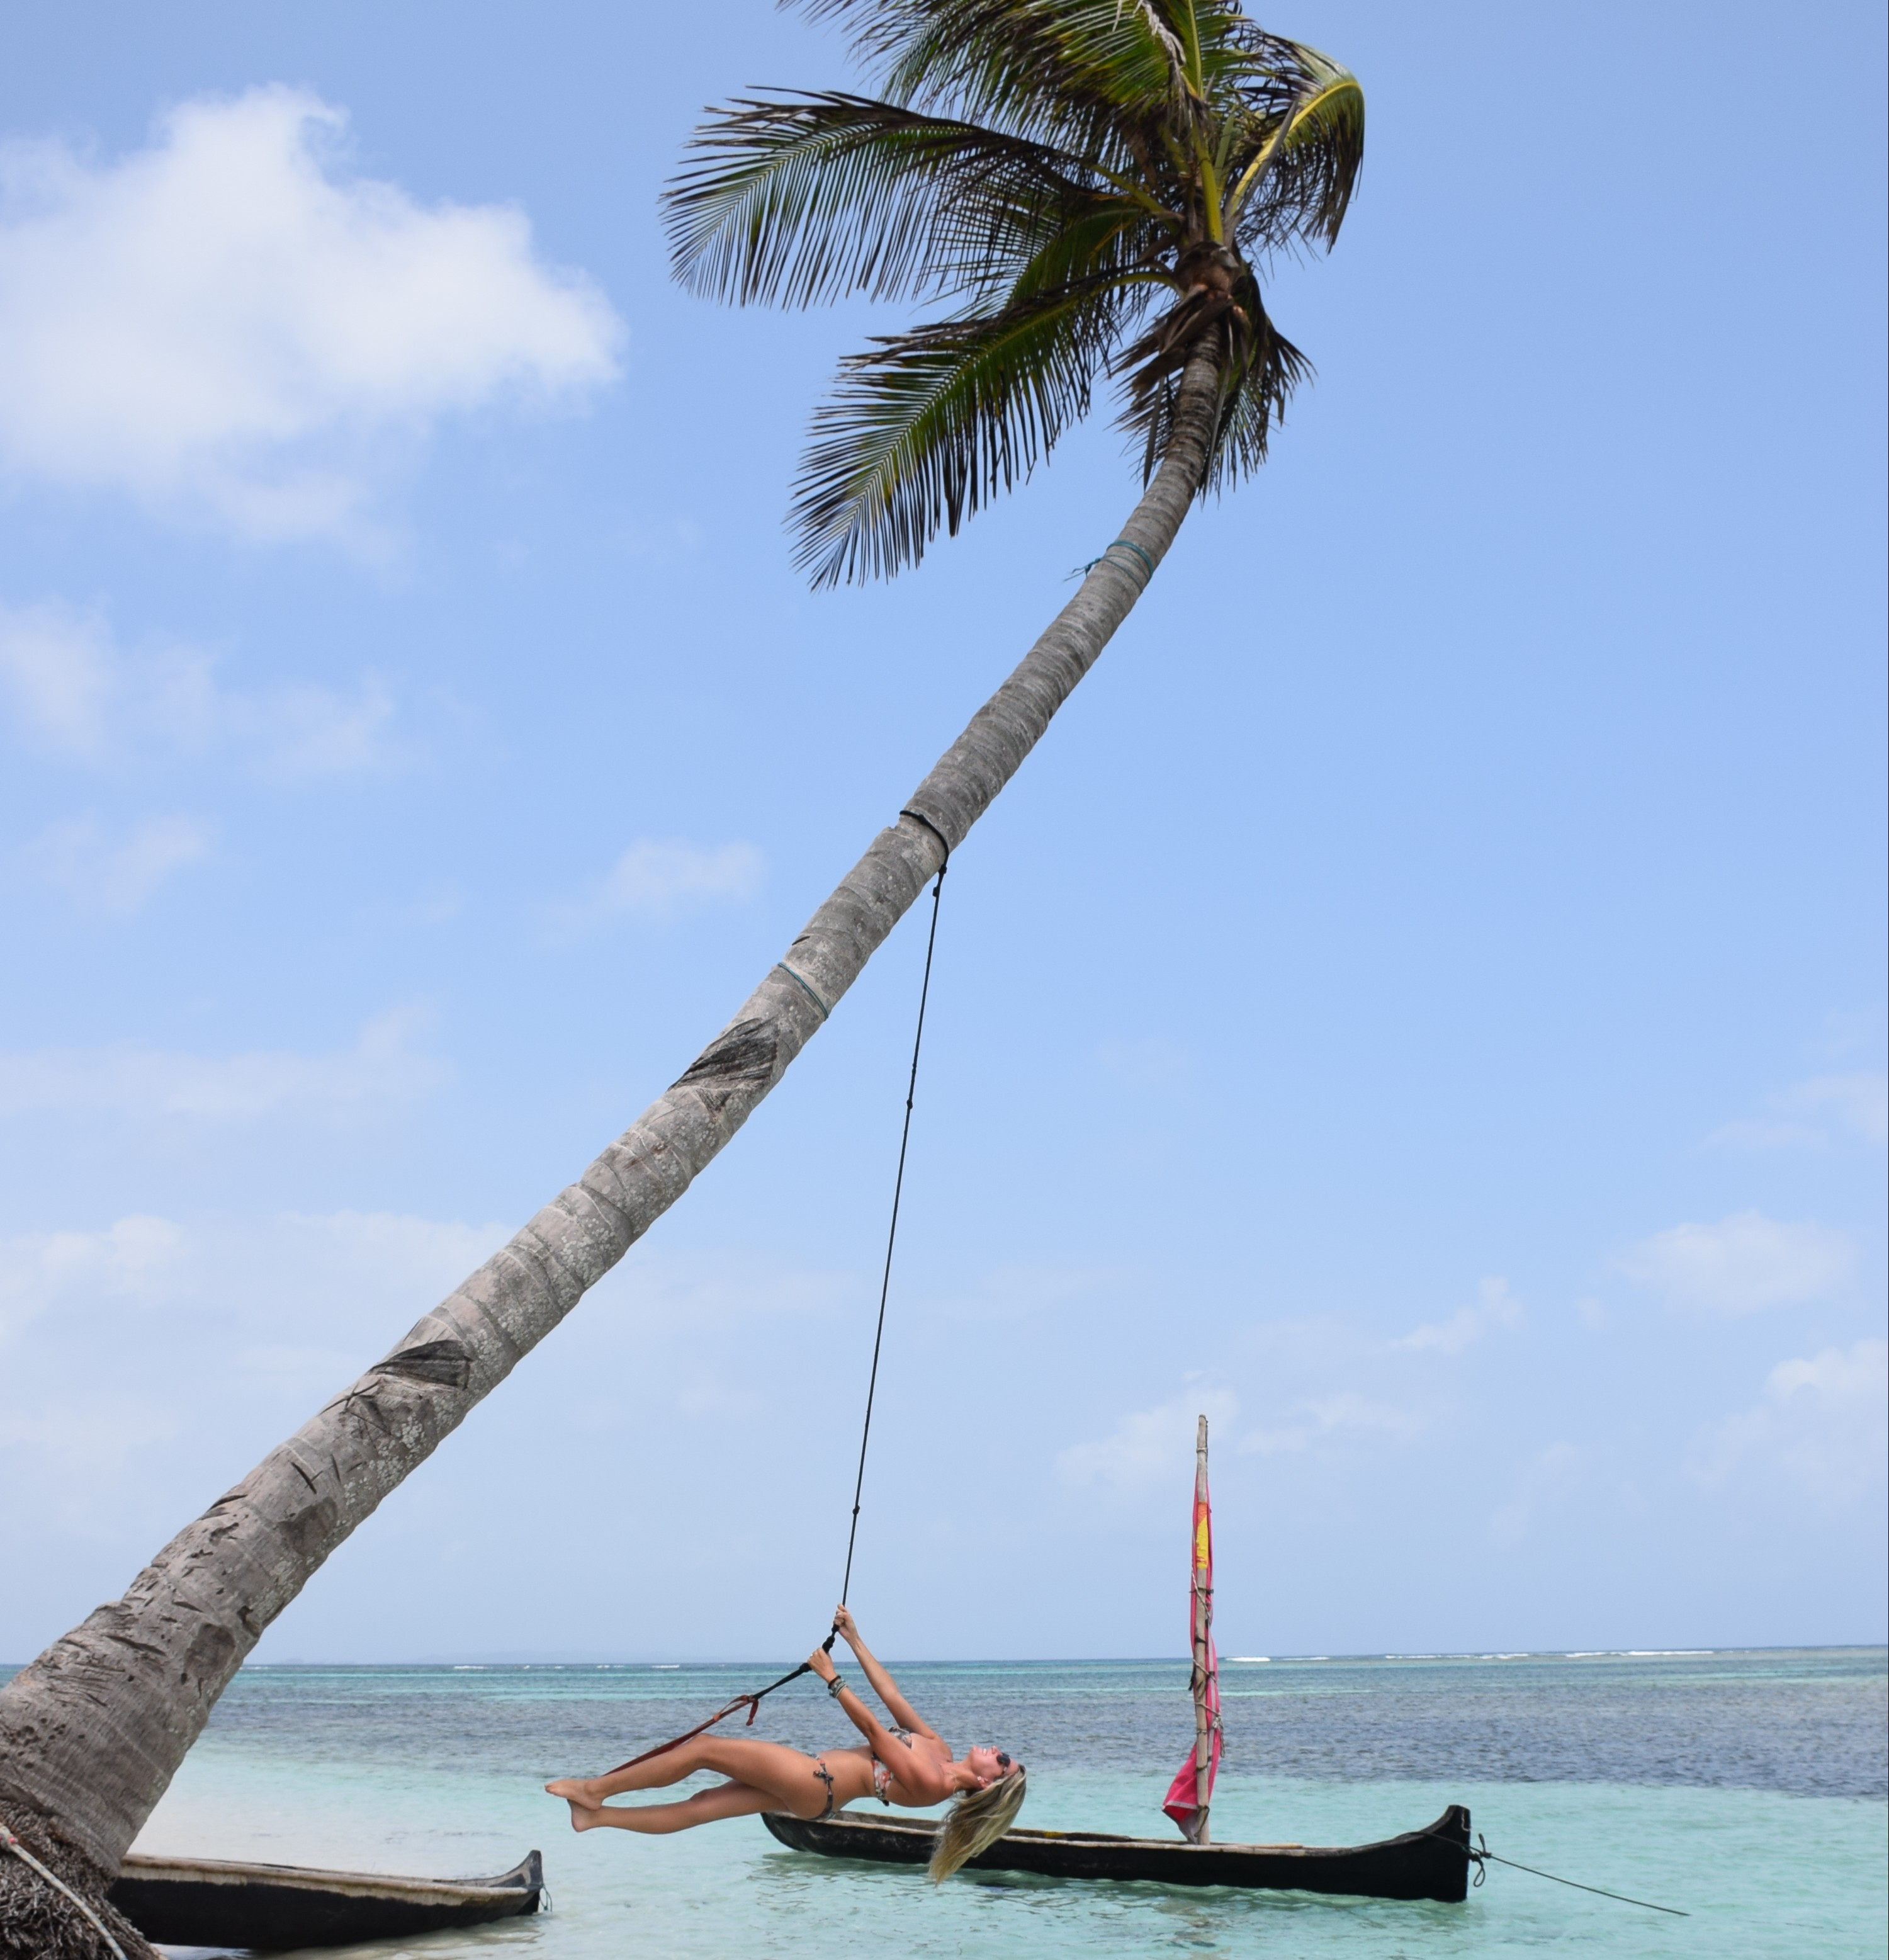 Macaquinha na Isla Chicheme Chico - San Blas - Panamá